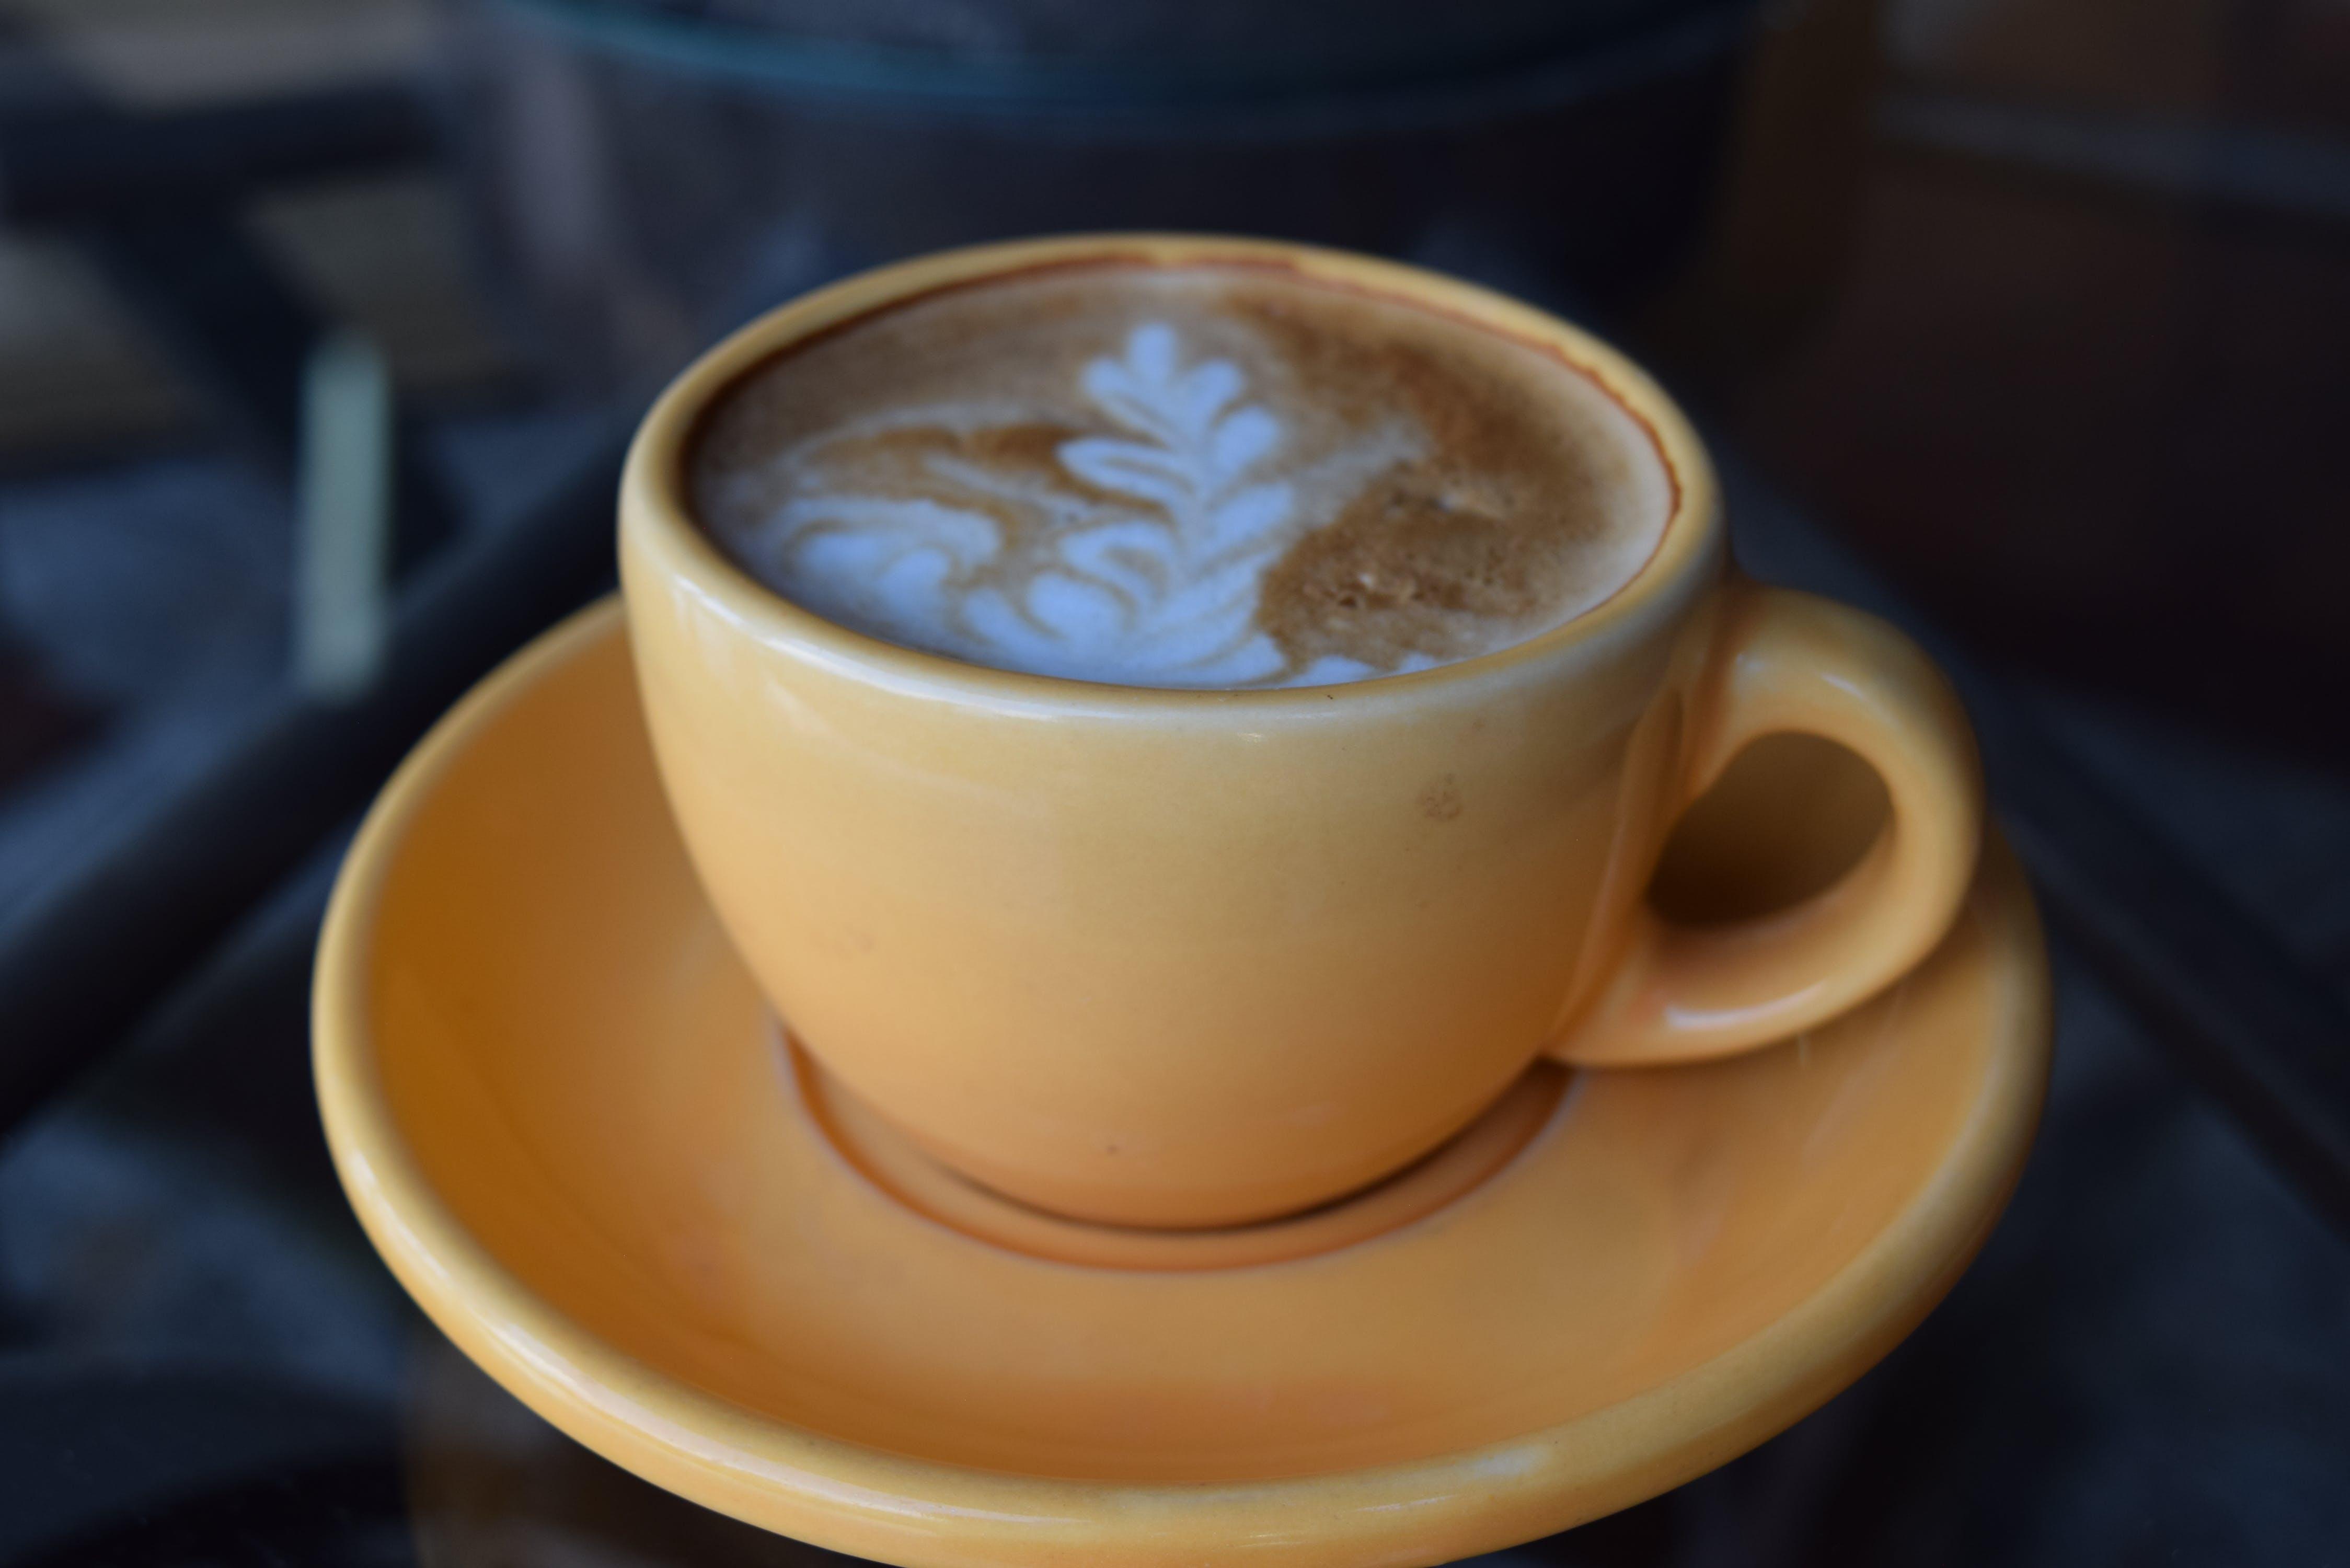 Kostenloses Stock Foto zu becher, braun, café, fokus